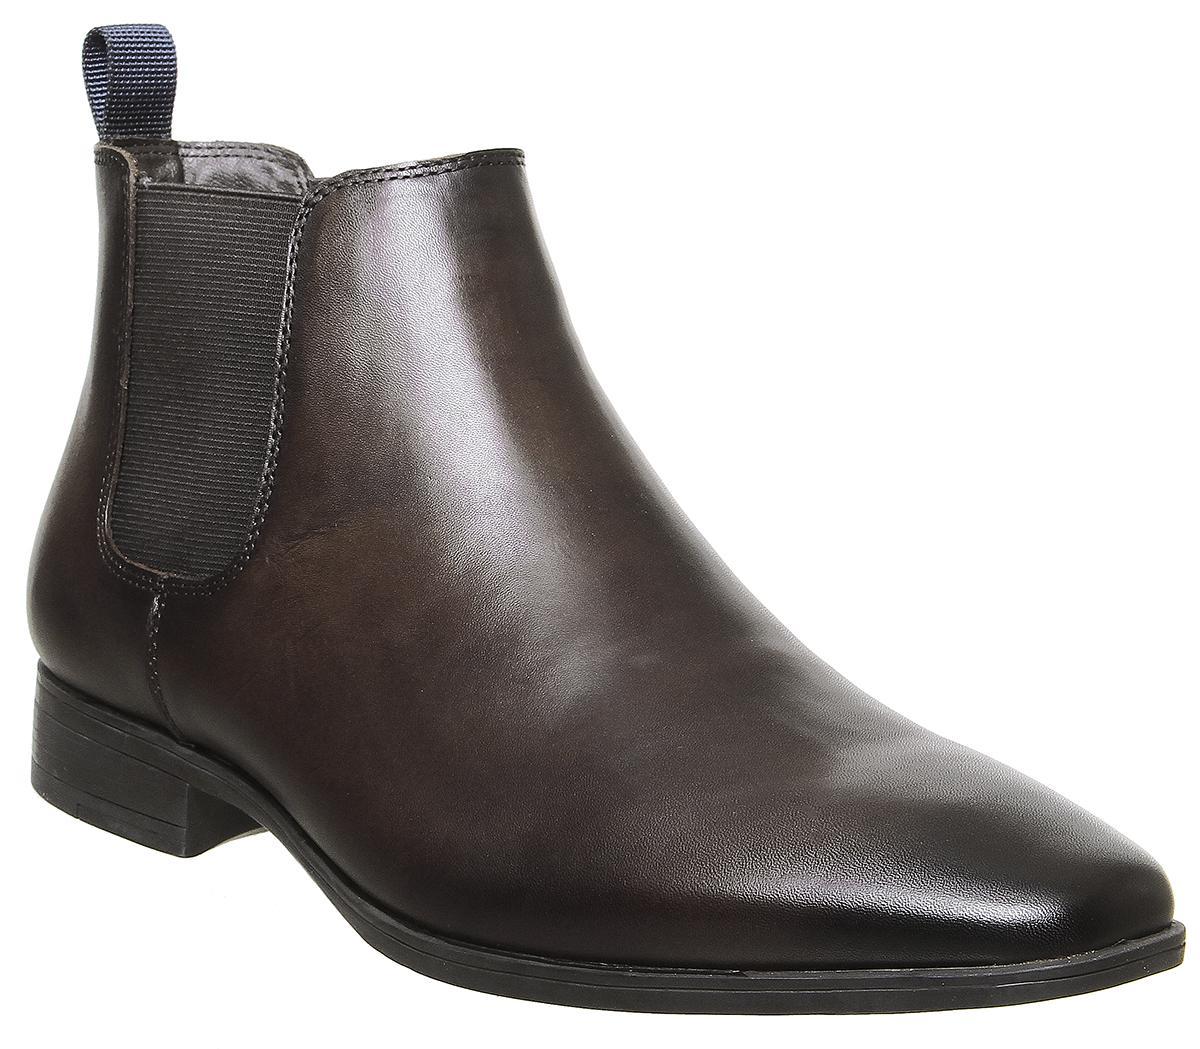 Boe Chelsea Boots